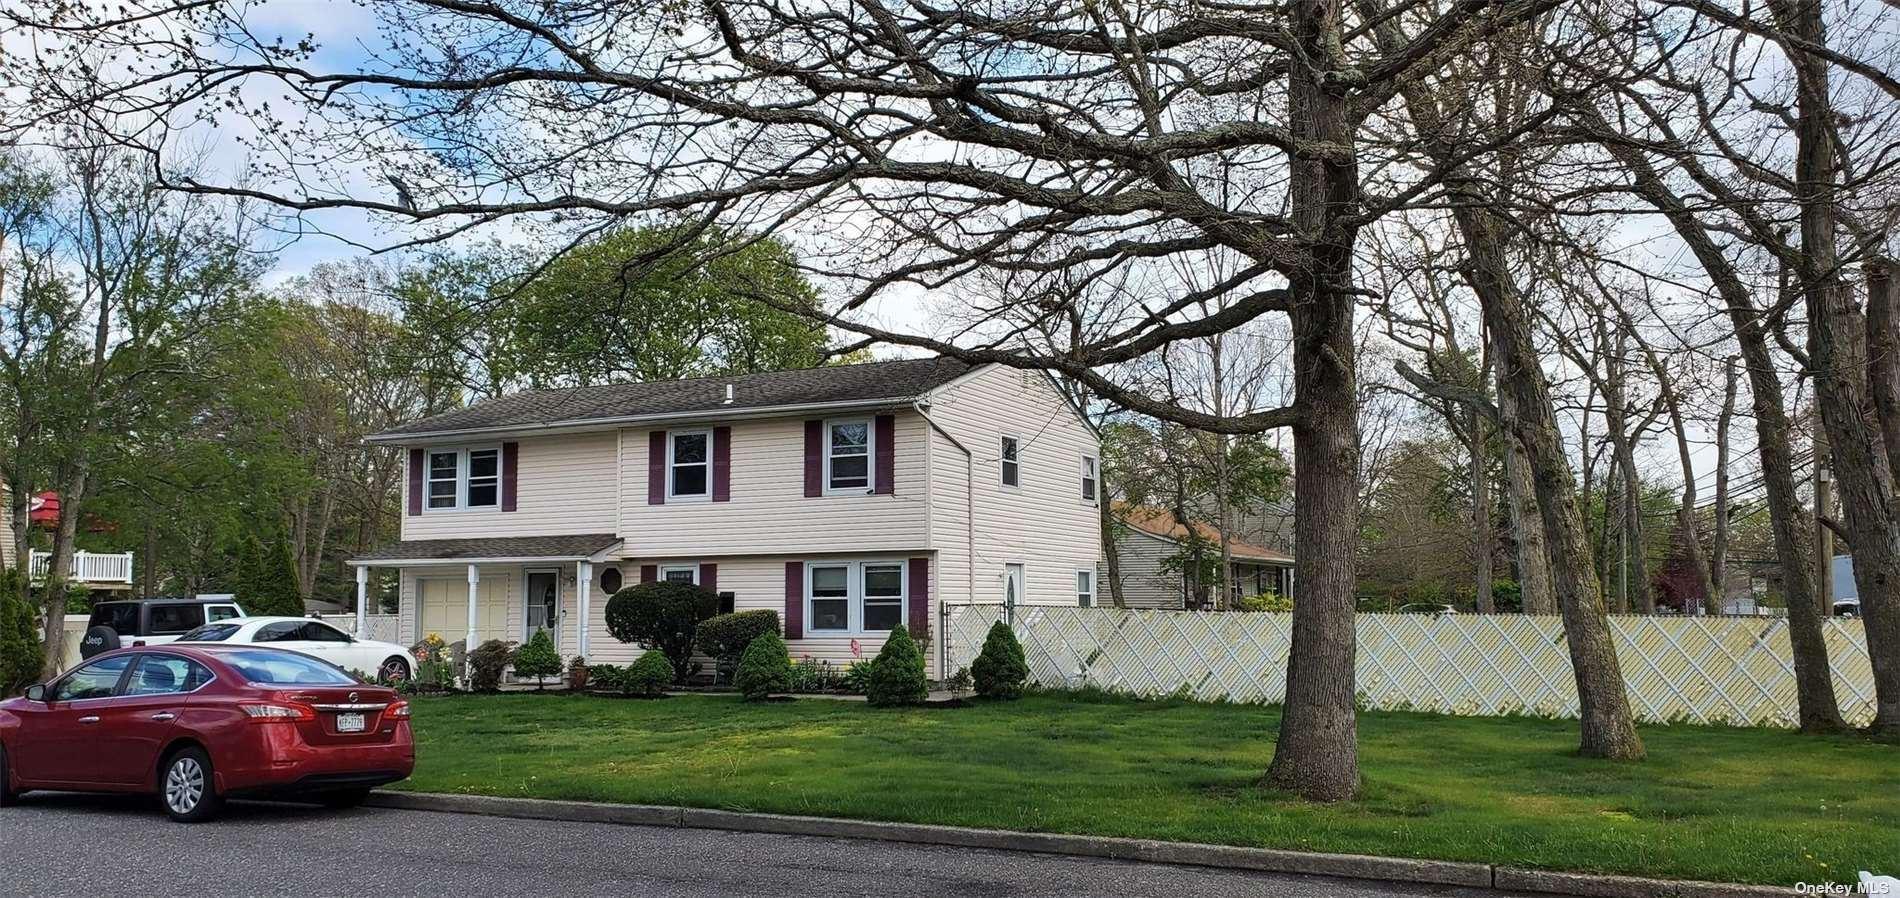 106 Fig Street, Central Islip, NY 11722 - MLS#: 3310023